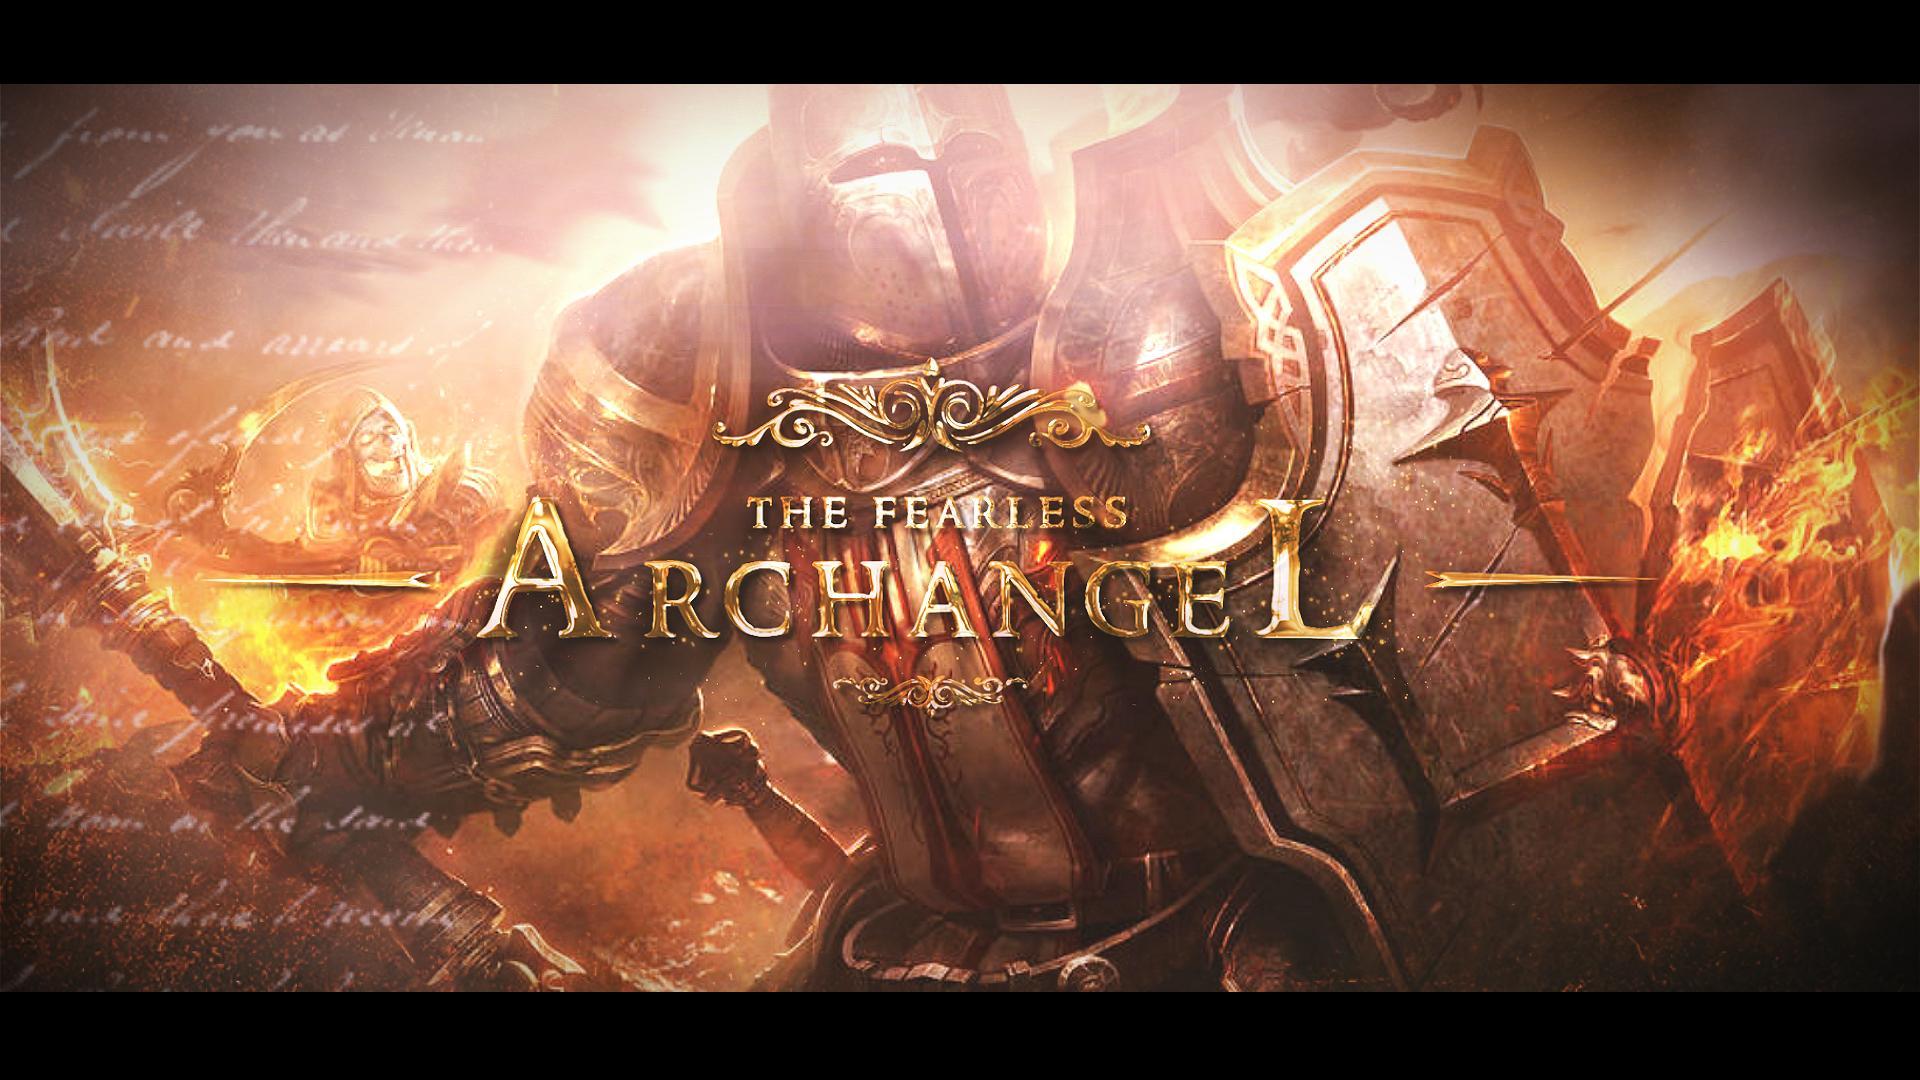 Archangel - Epic Fantasy Trailer - 6